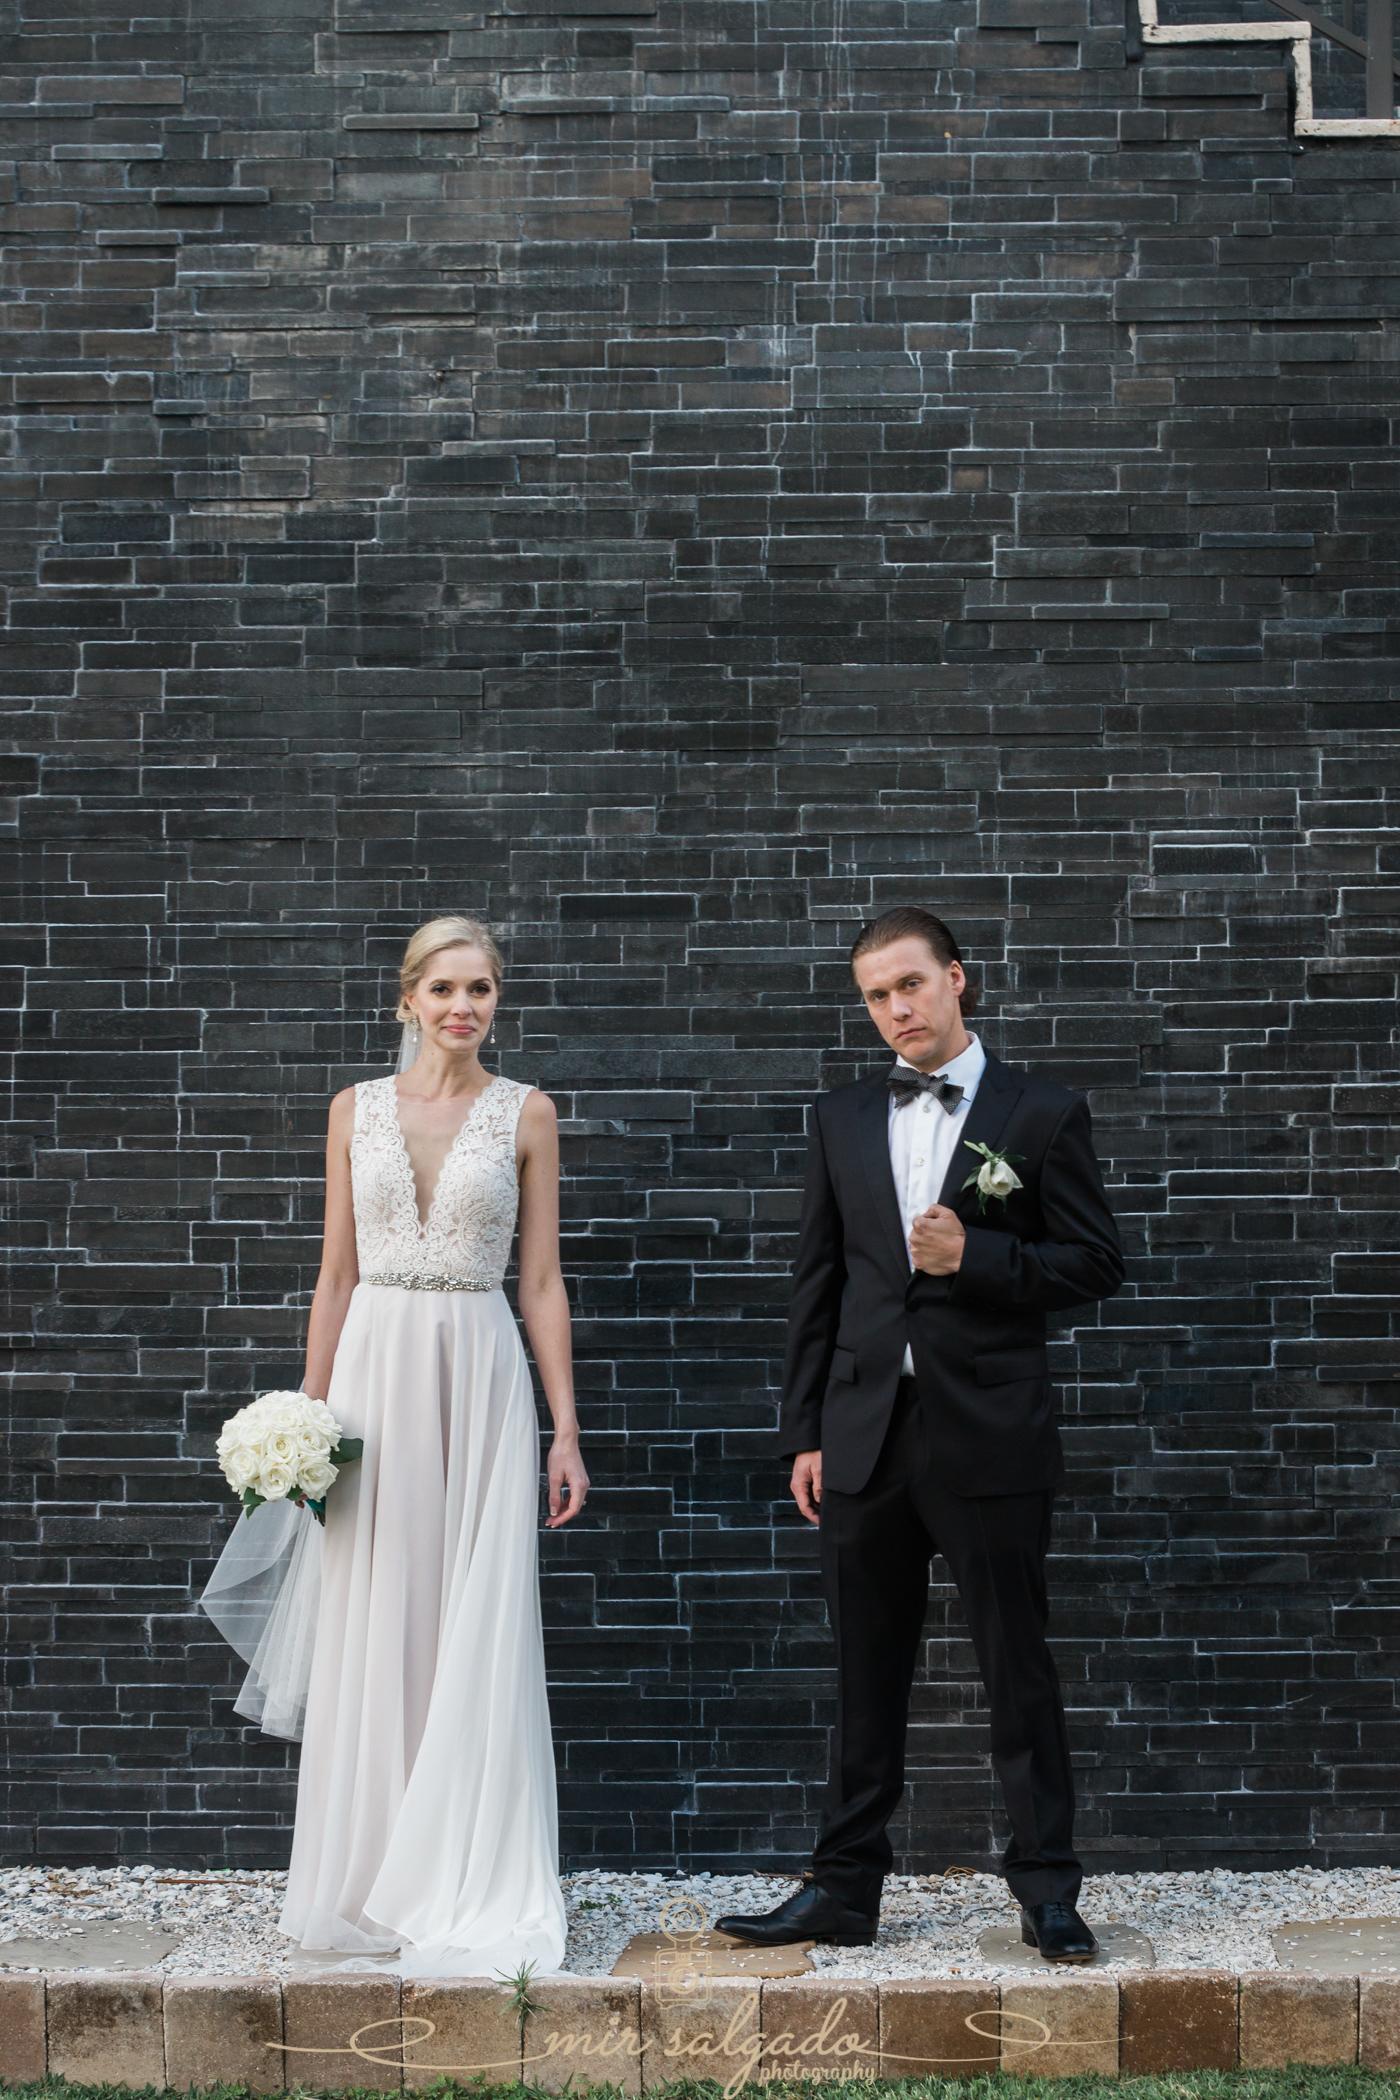 St.Pete-wedding-photographer, St.Pete-wedding-photo